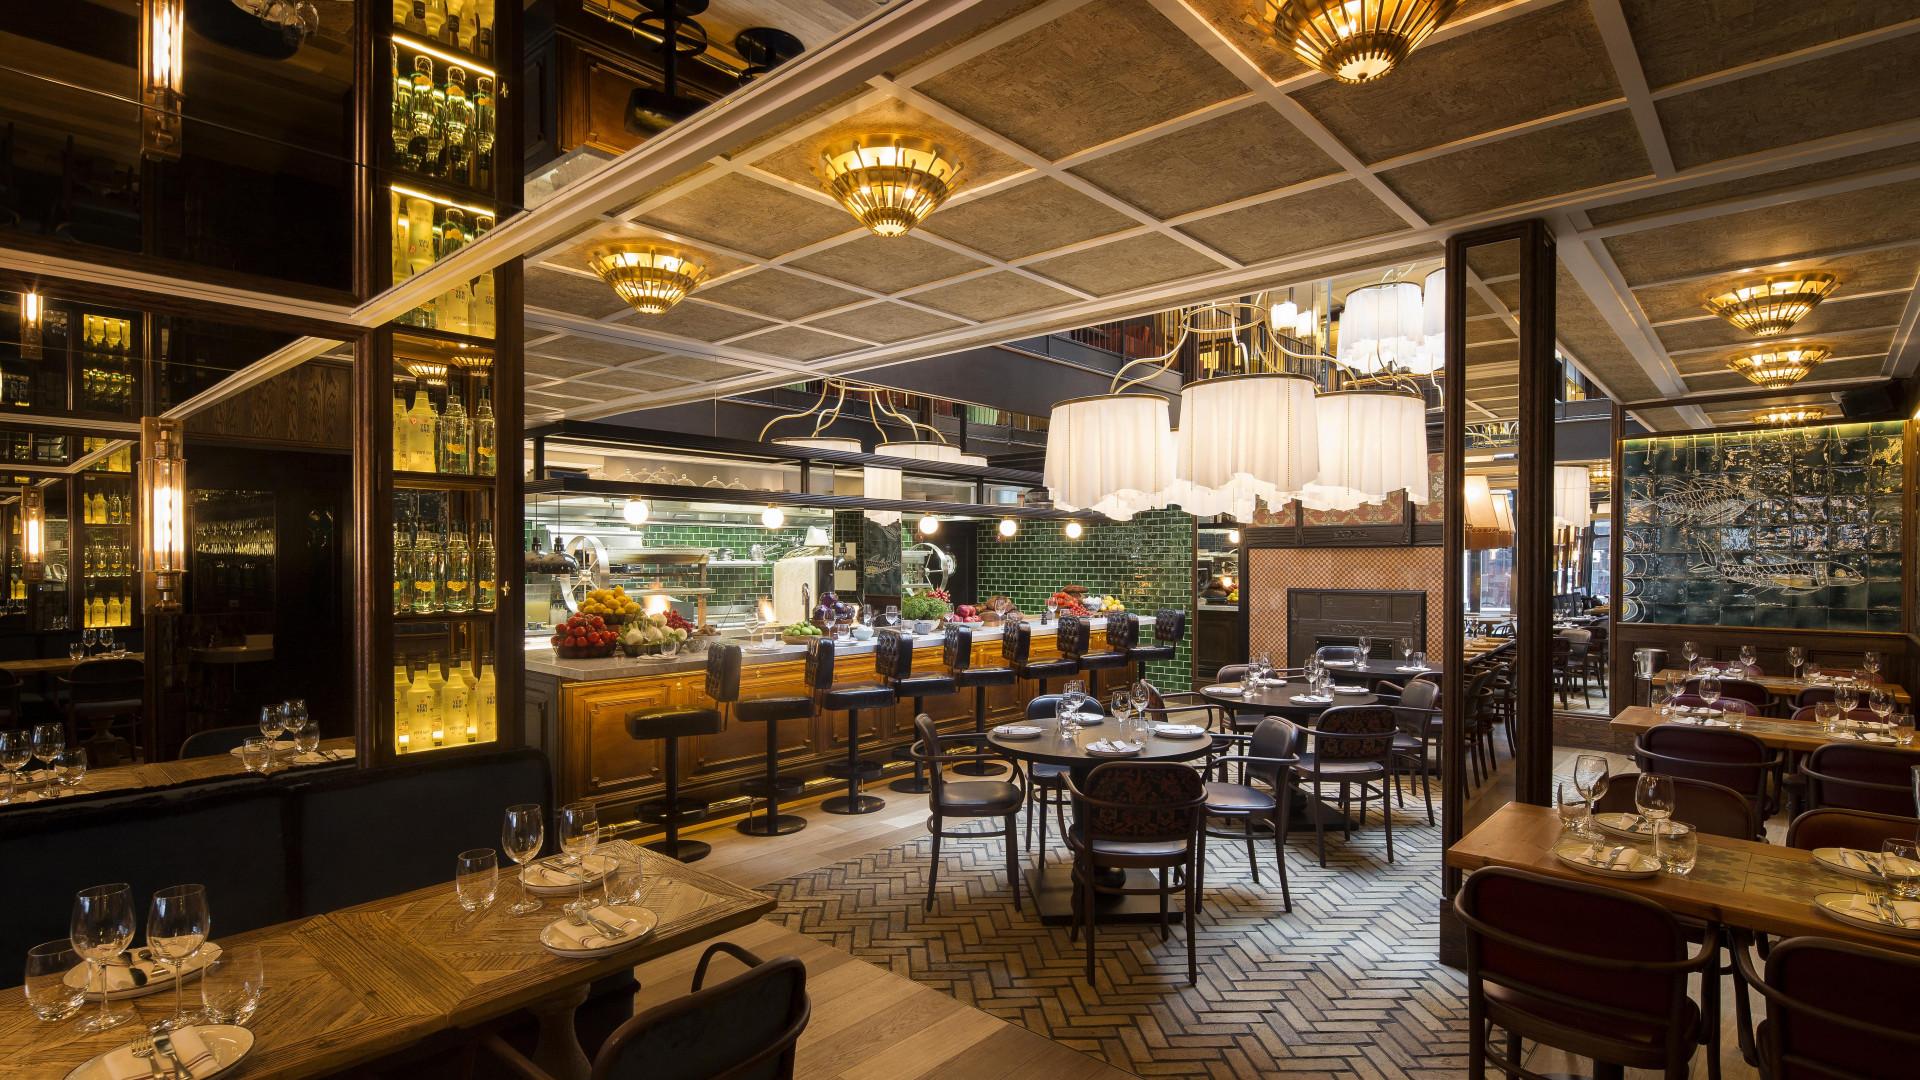 Soho restaurant guide: HOVARDA